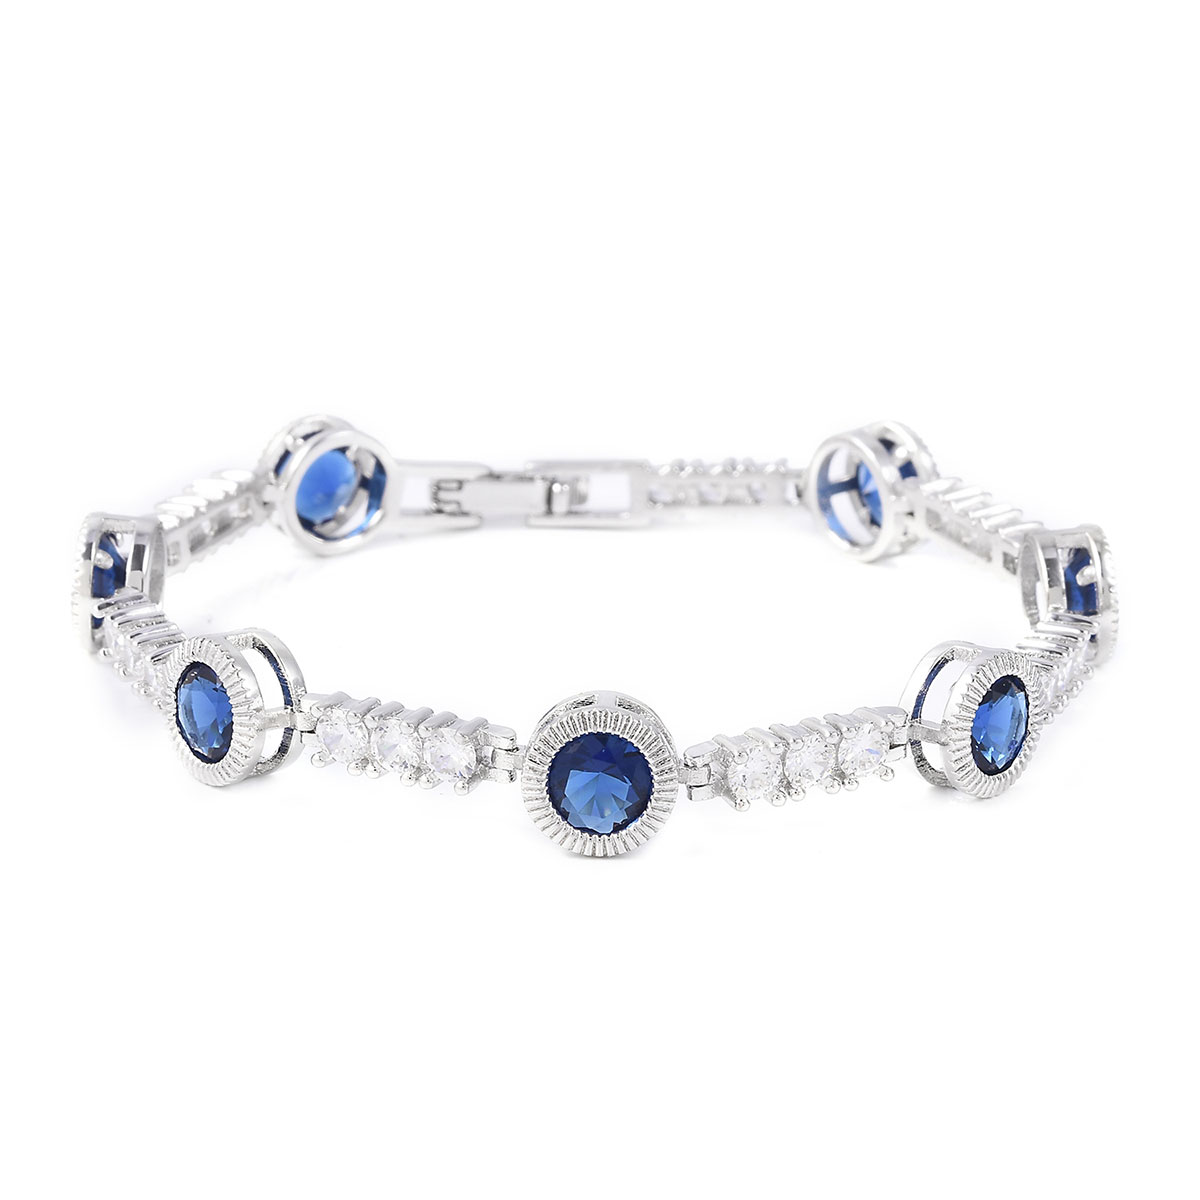 Shop LC Delivering Joy Sapphire Blue Color Glass White Cubic Zirconia CZ Bangle Bracelet in Silvertone 8 inch